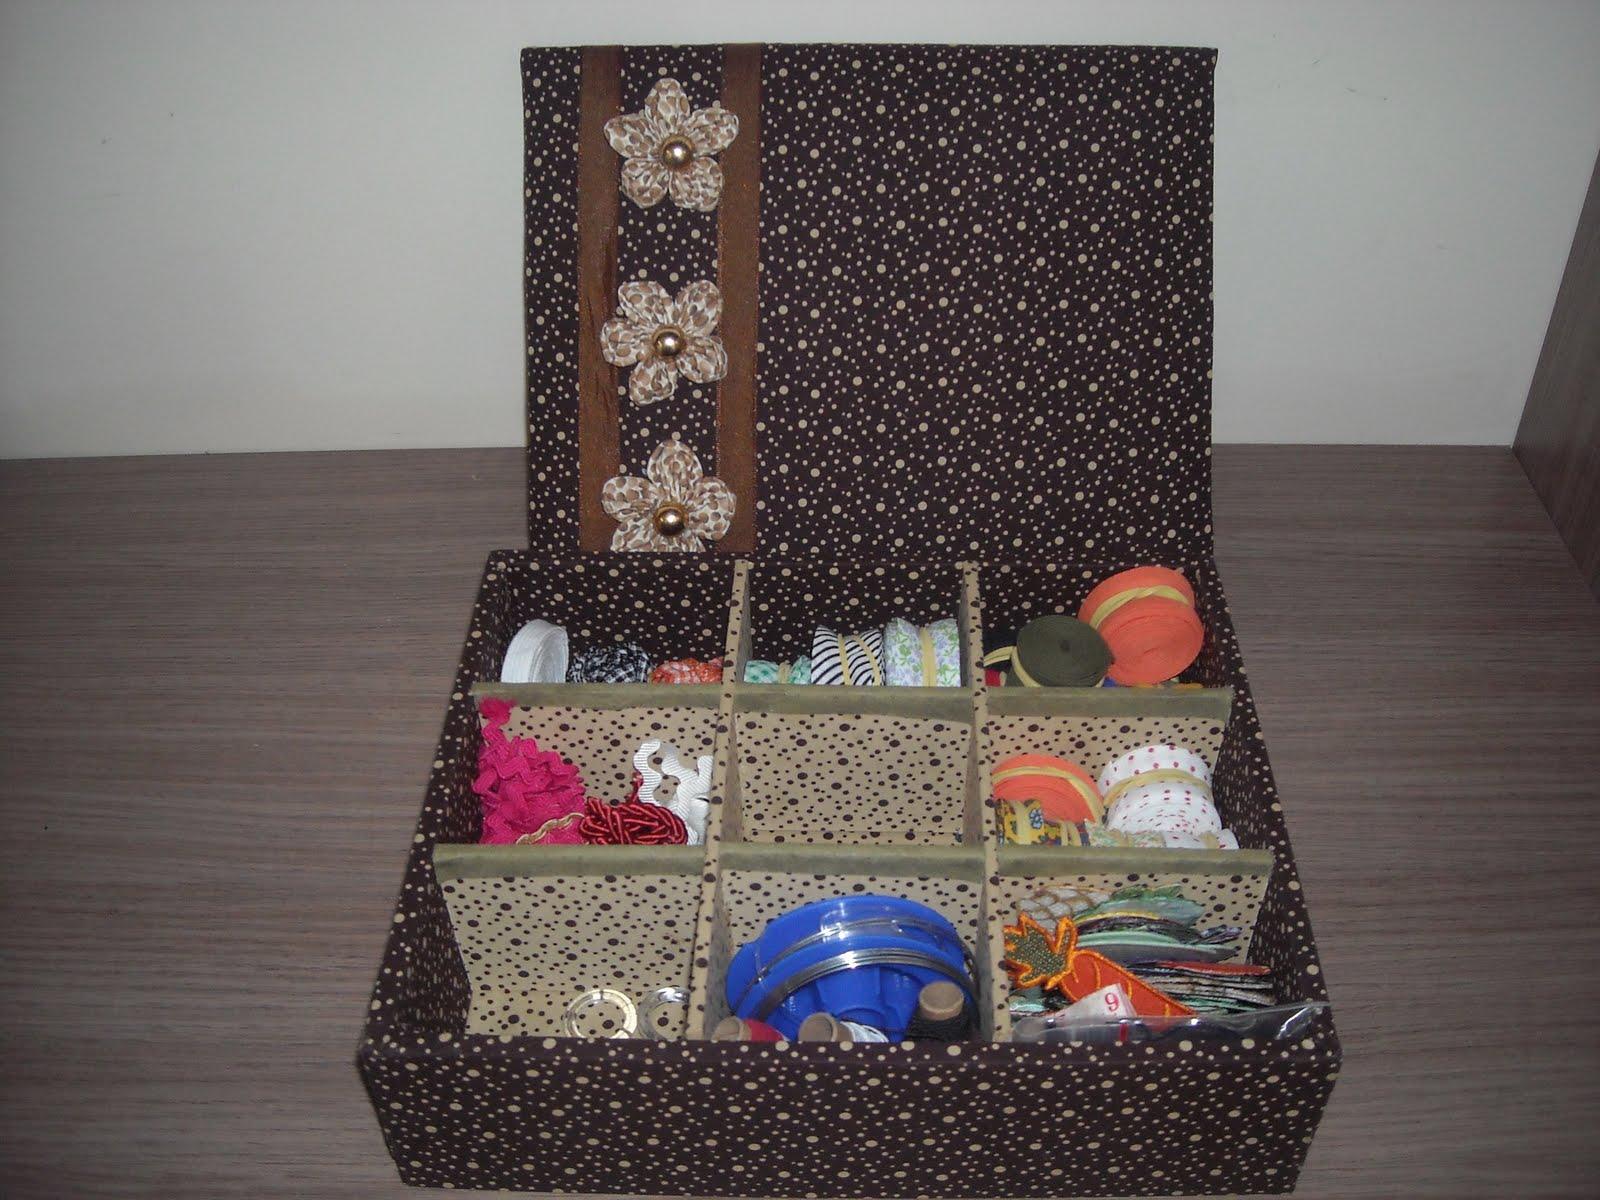 Artes na Vida de Isa: Caixa forrada com tecido #9A4731 1600x1200